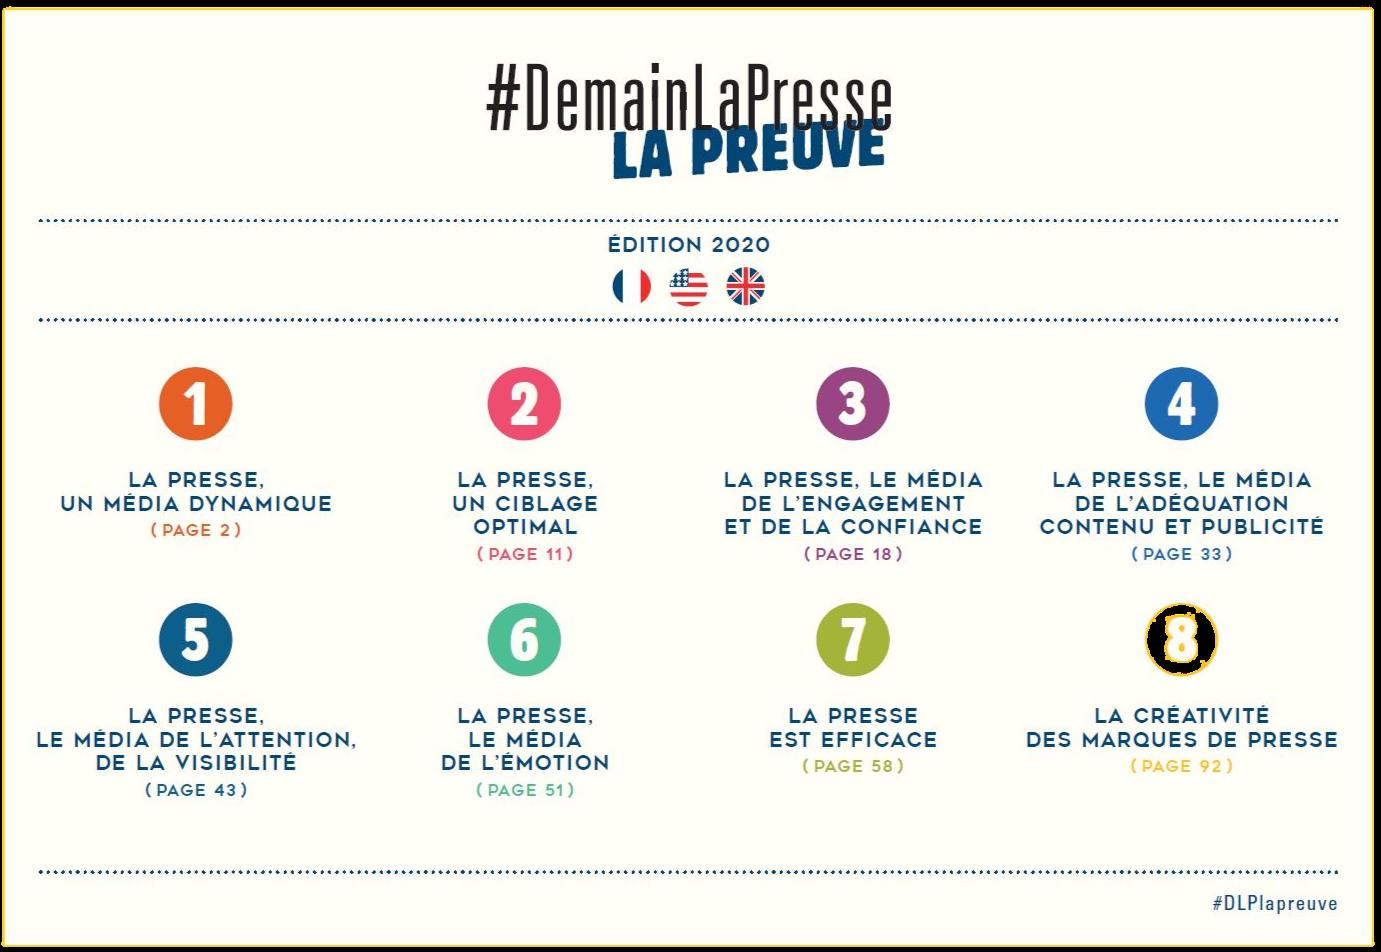 #DemainlaPresse LaPreuve2020